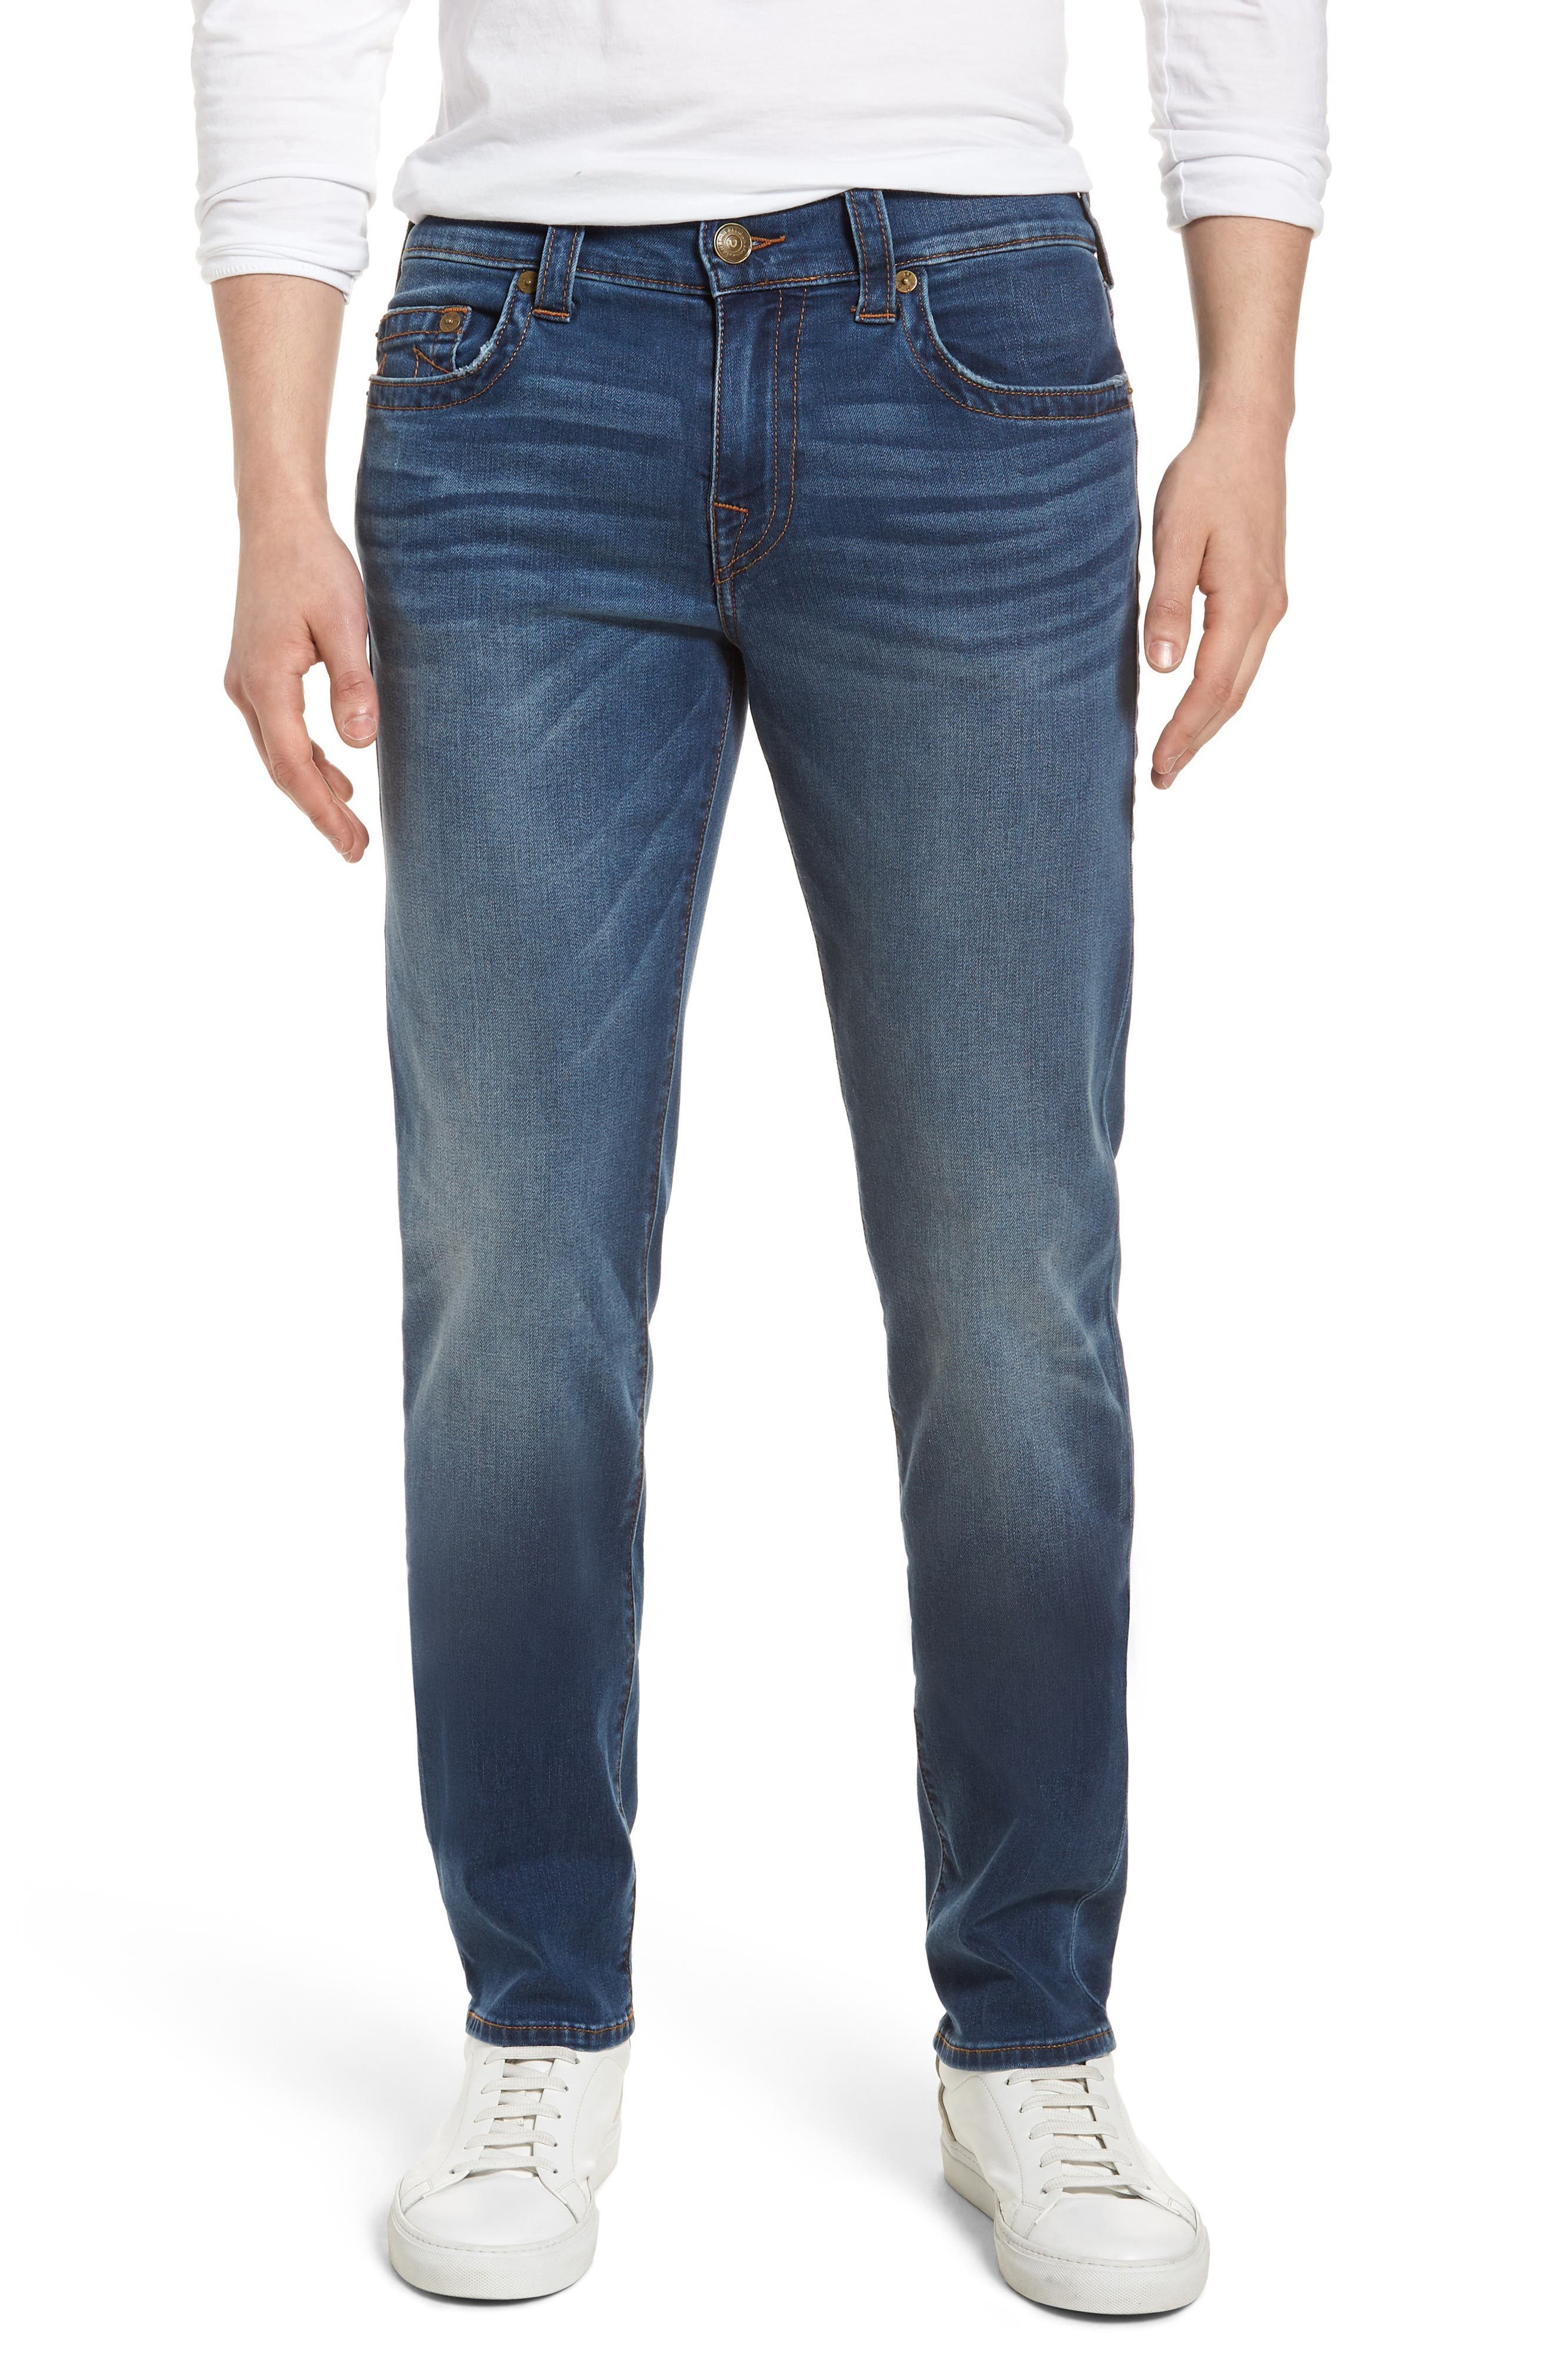 Geno Straight Leg Jeans,                         Main,                         color, INDIGO LAKE